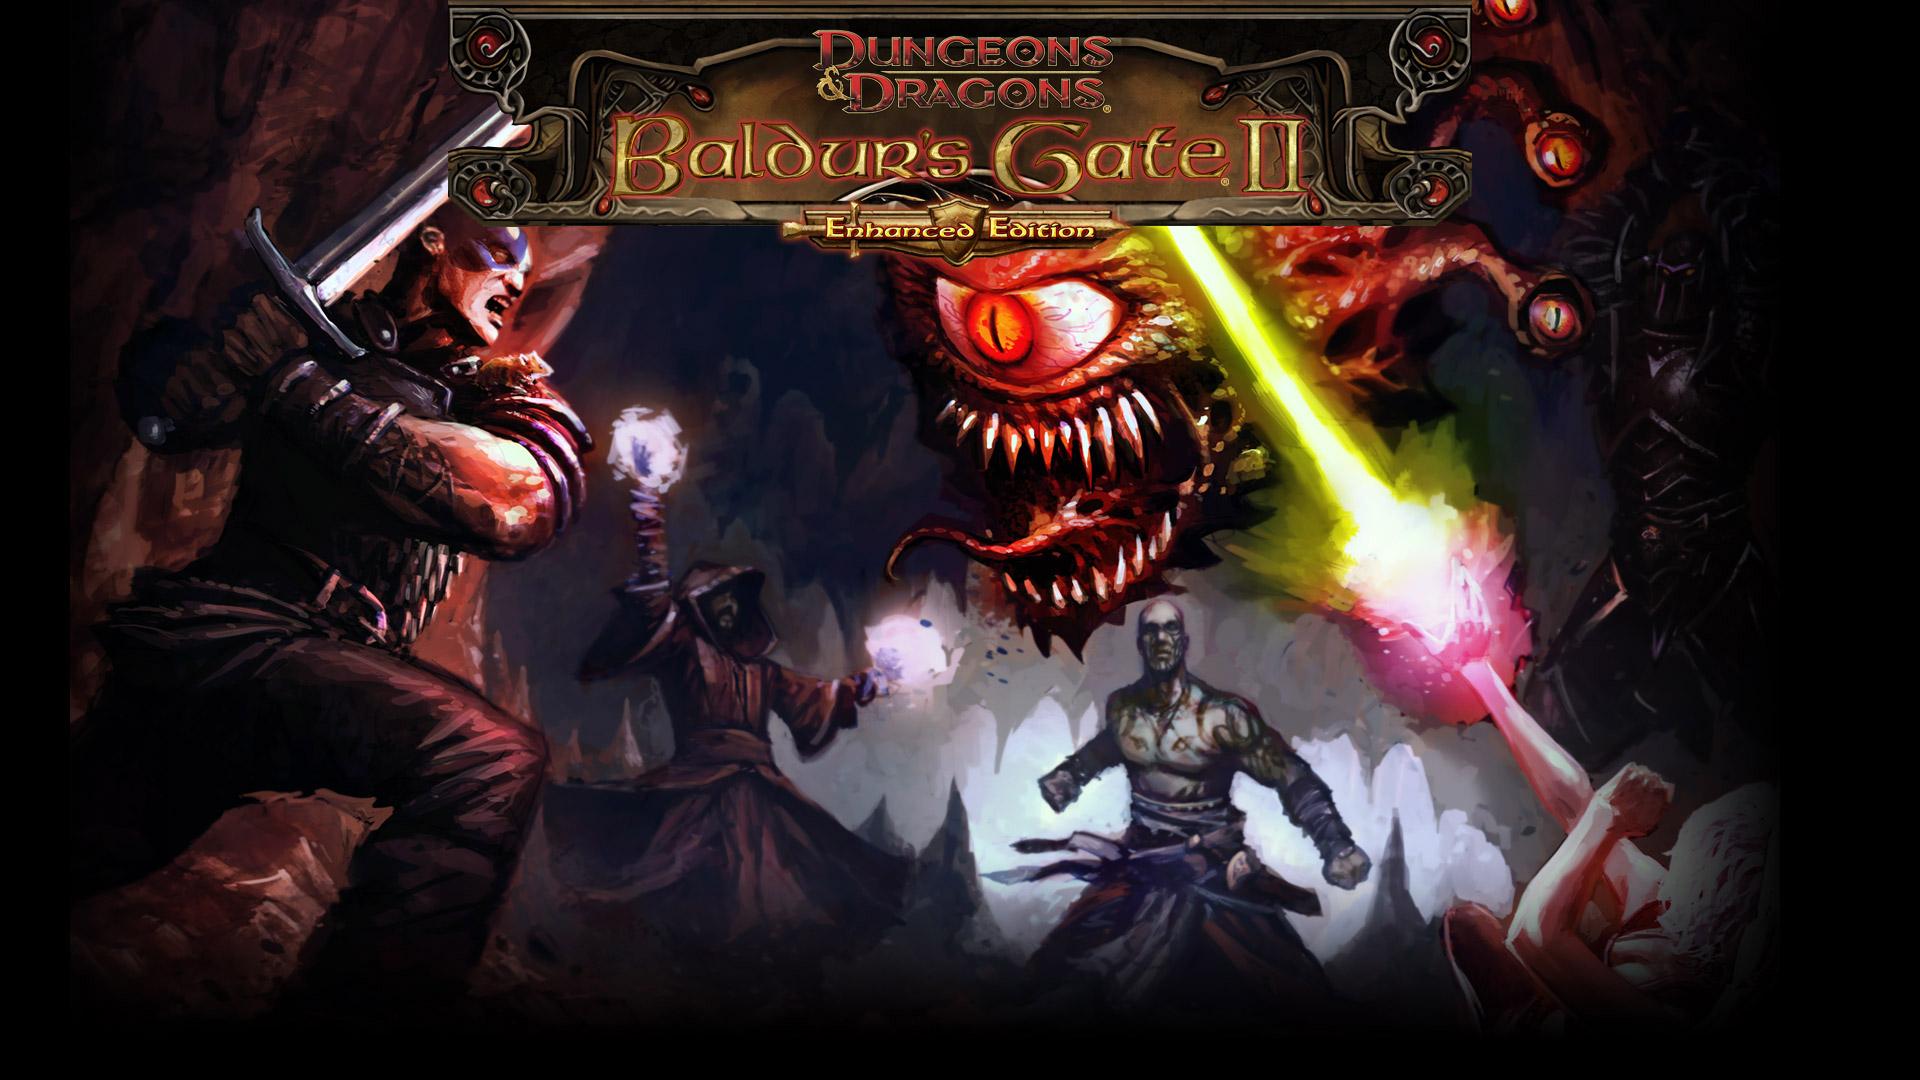 Baldur's gate enhanced edition – everything you need to know.